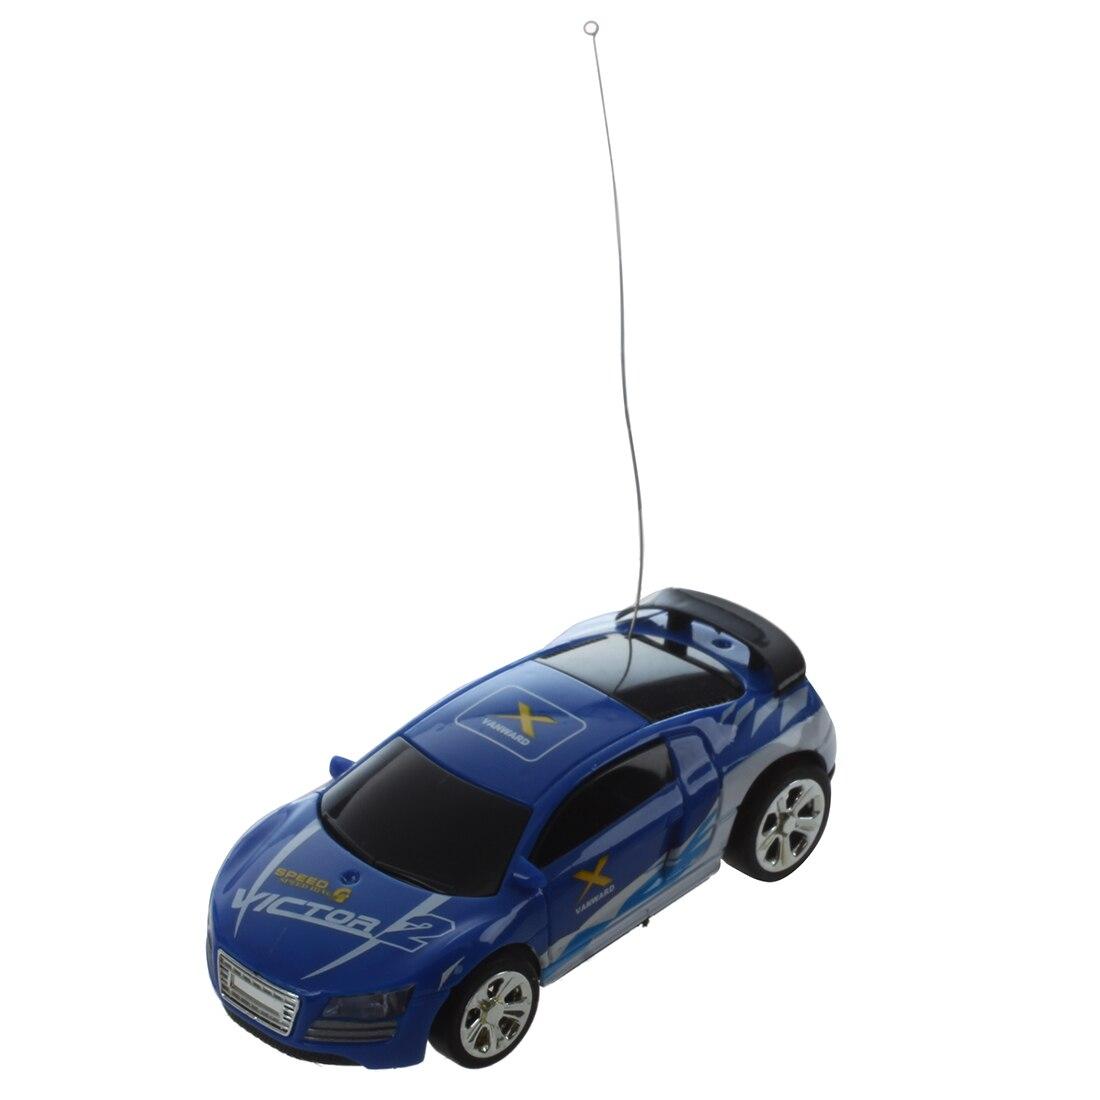 MINI MICRO RC CAR Radio Controlled 1:58 CAN BOX SERIAL SHEN QI WEI white blue